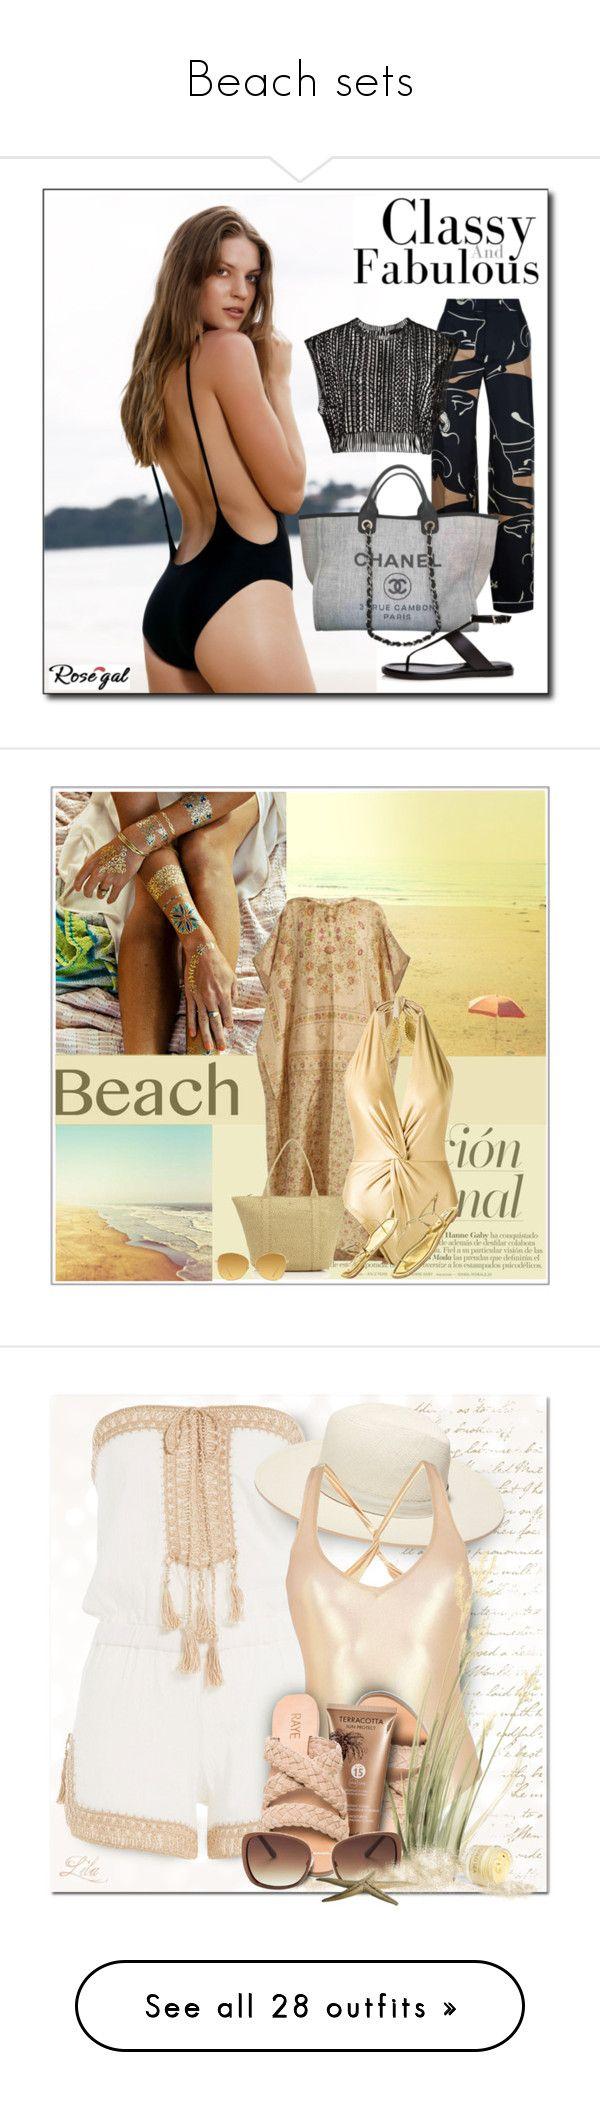 """Beach sets"" by lionfishka ❤ liked on Polyvore featuring Valentino, Chanel, La Perla, Therapy, Mes Demoiselles..., Eric Javits, Martha Medeiros, Prada, Linda Farrow and Anna Kosturova"